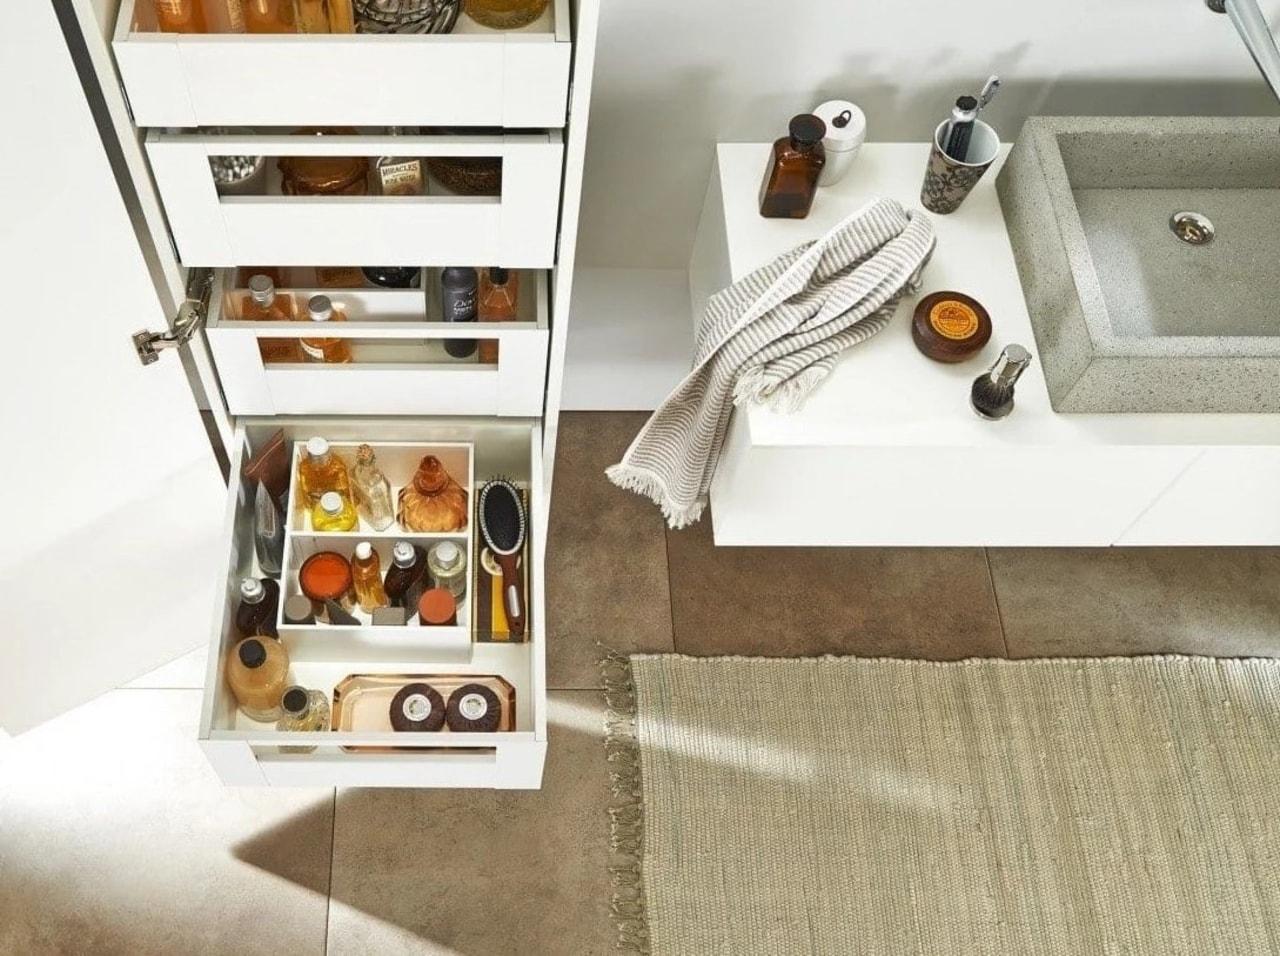 Image from: Blum New Zealand floor, furniture, shelf, white